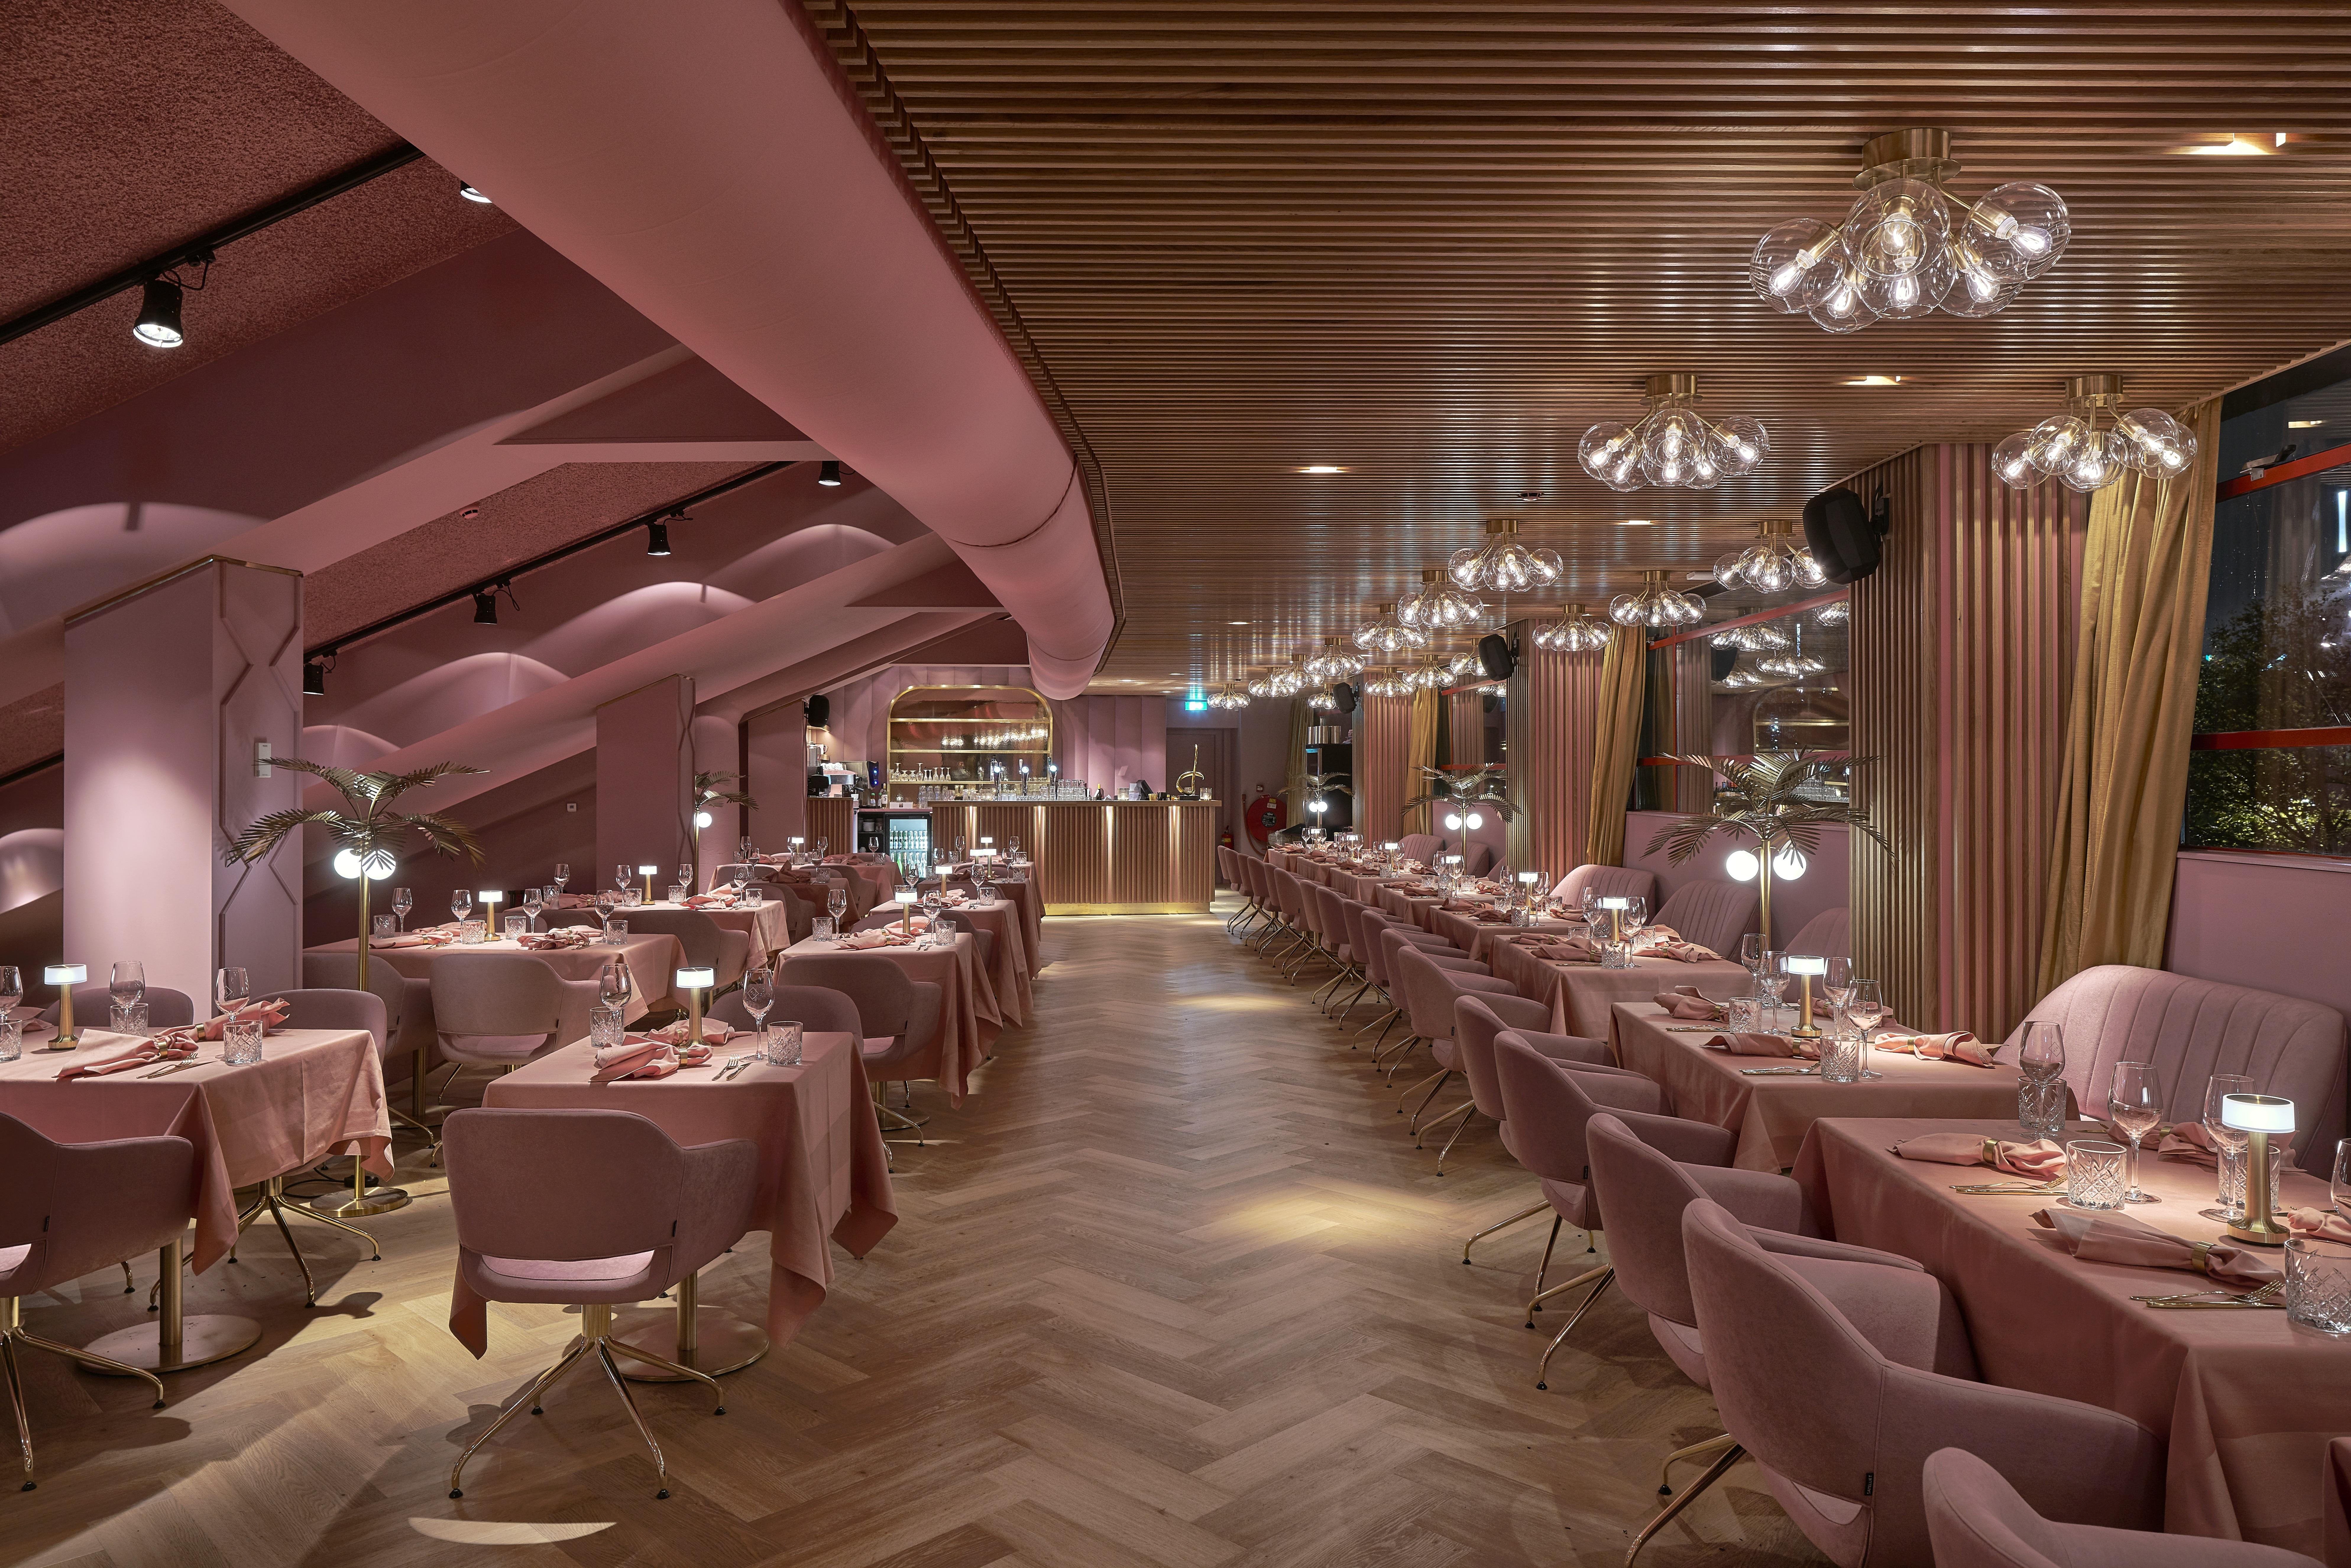 Roze restaurant MaMa Kelly in Amsterdam, Olympisch Stadion